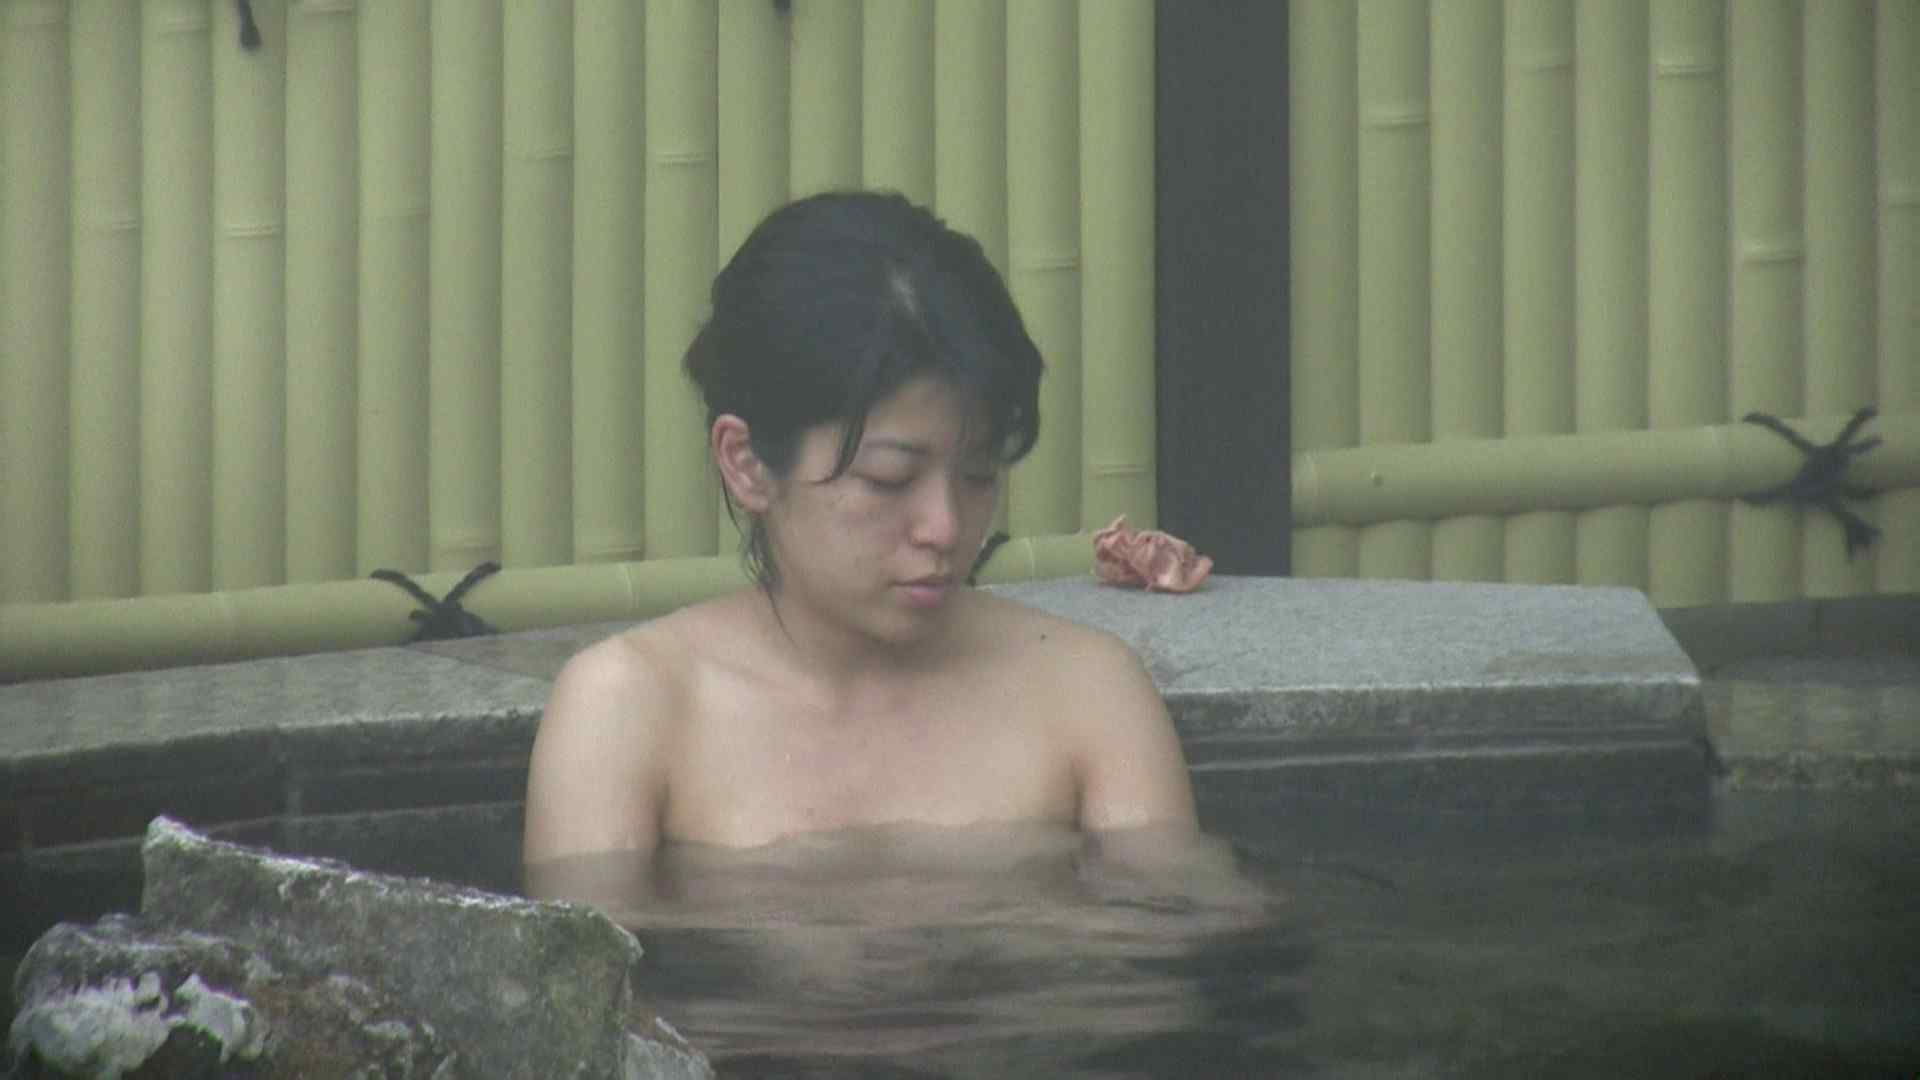 Aquaな露天風呂Vol.585 露天 オマンコ無修正動画無料 51画像 47